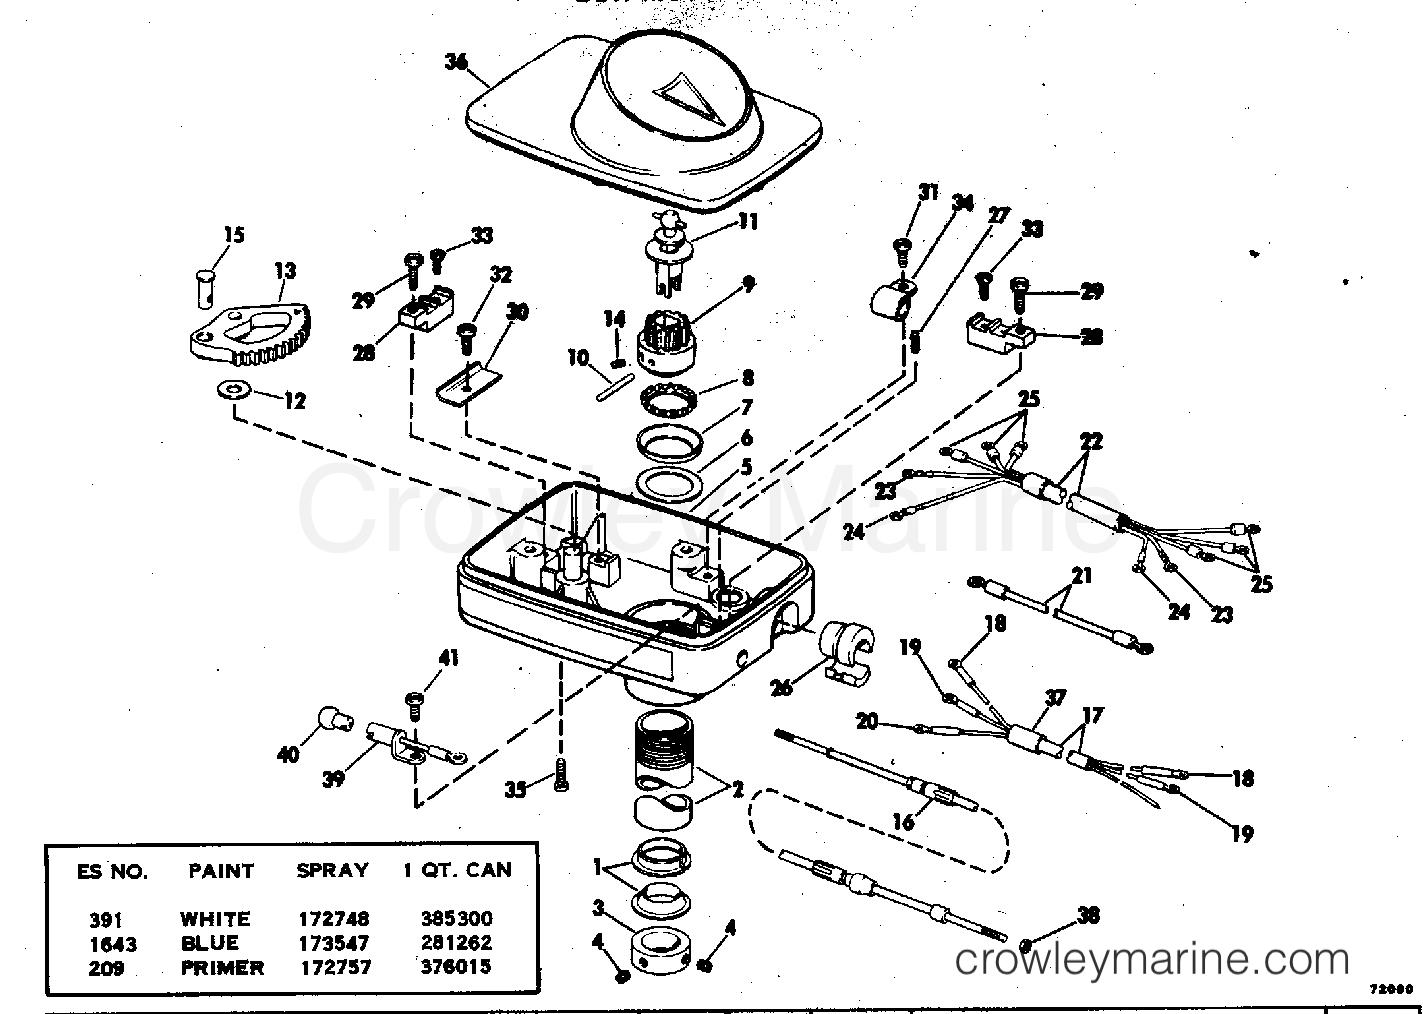 1978 Electric Motors 12 Volt - EB52R - STEERING HOUSING GROUP